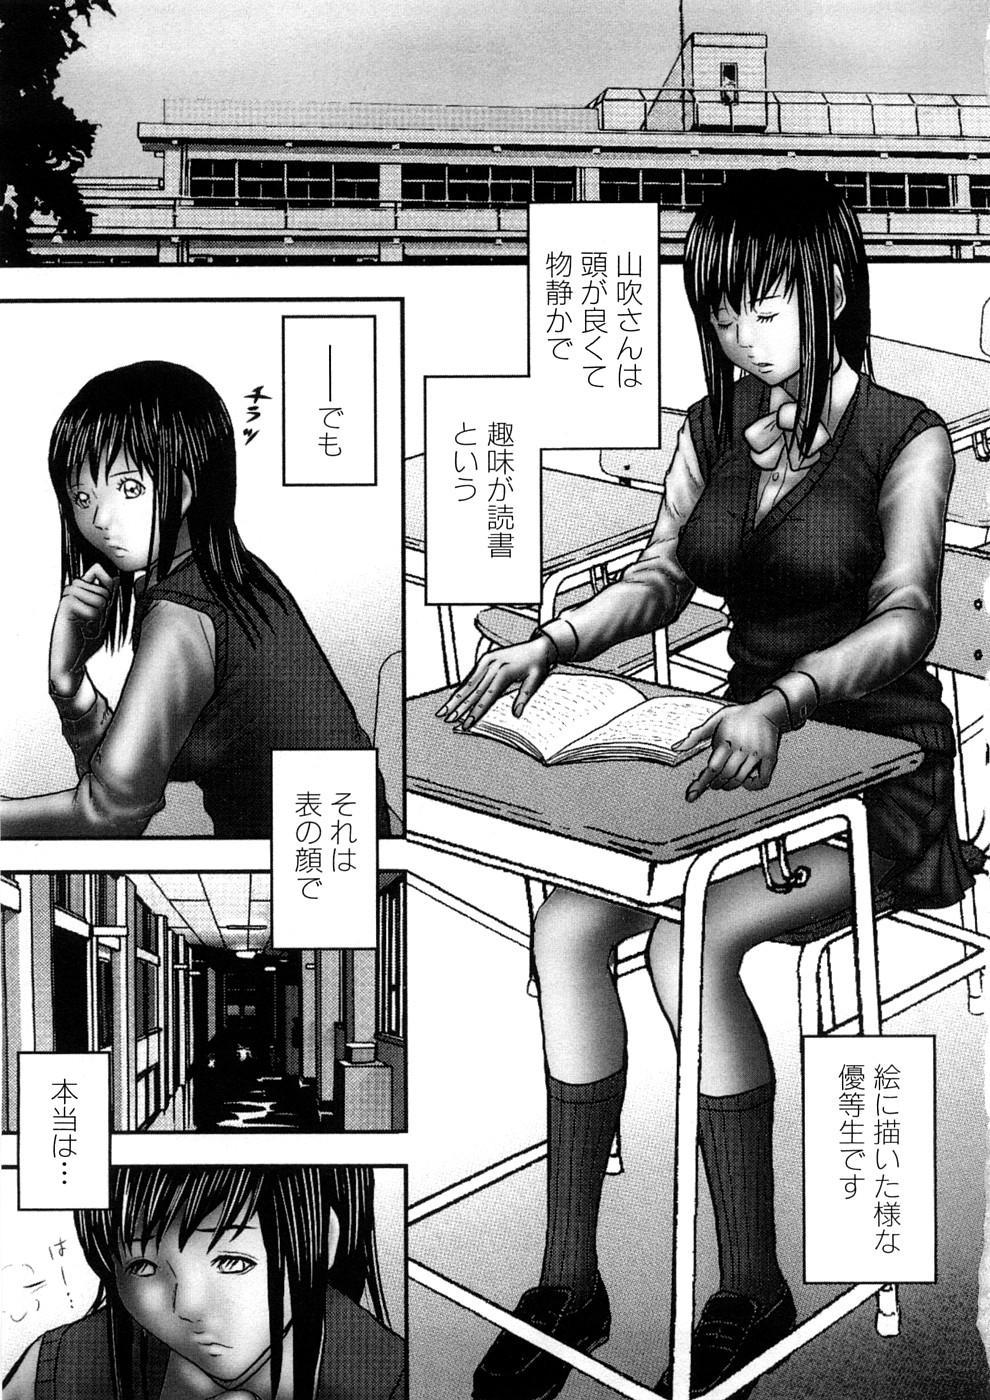 Geki Yaba Anthology Vol. 1 - Naka ni Dashite yo 219